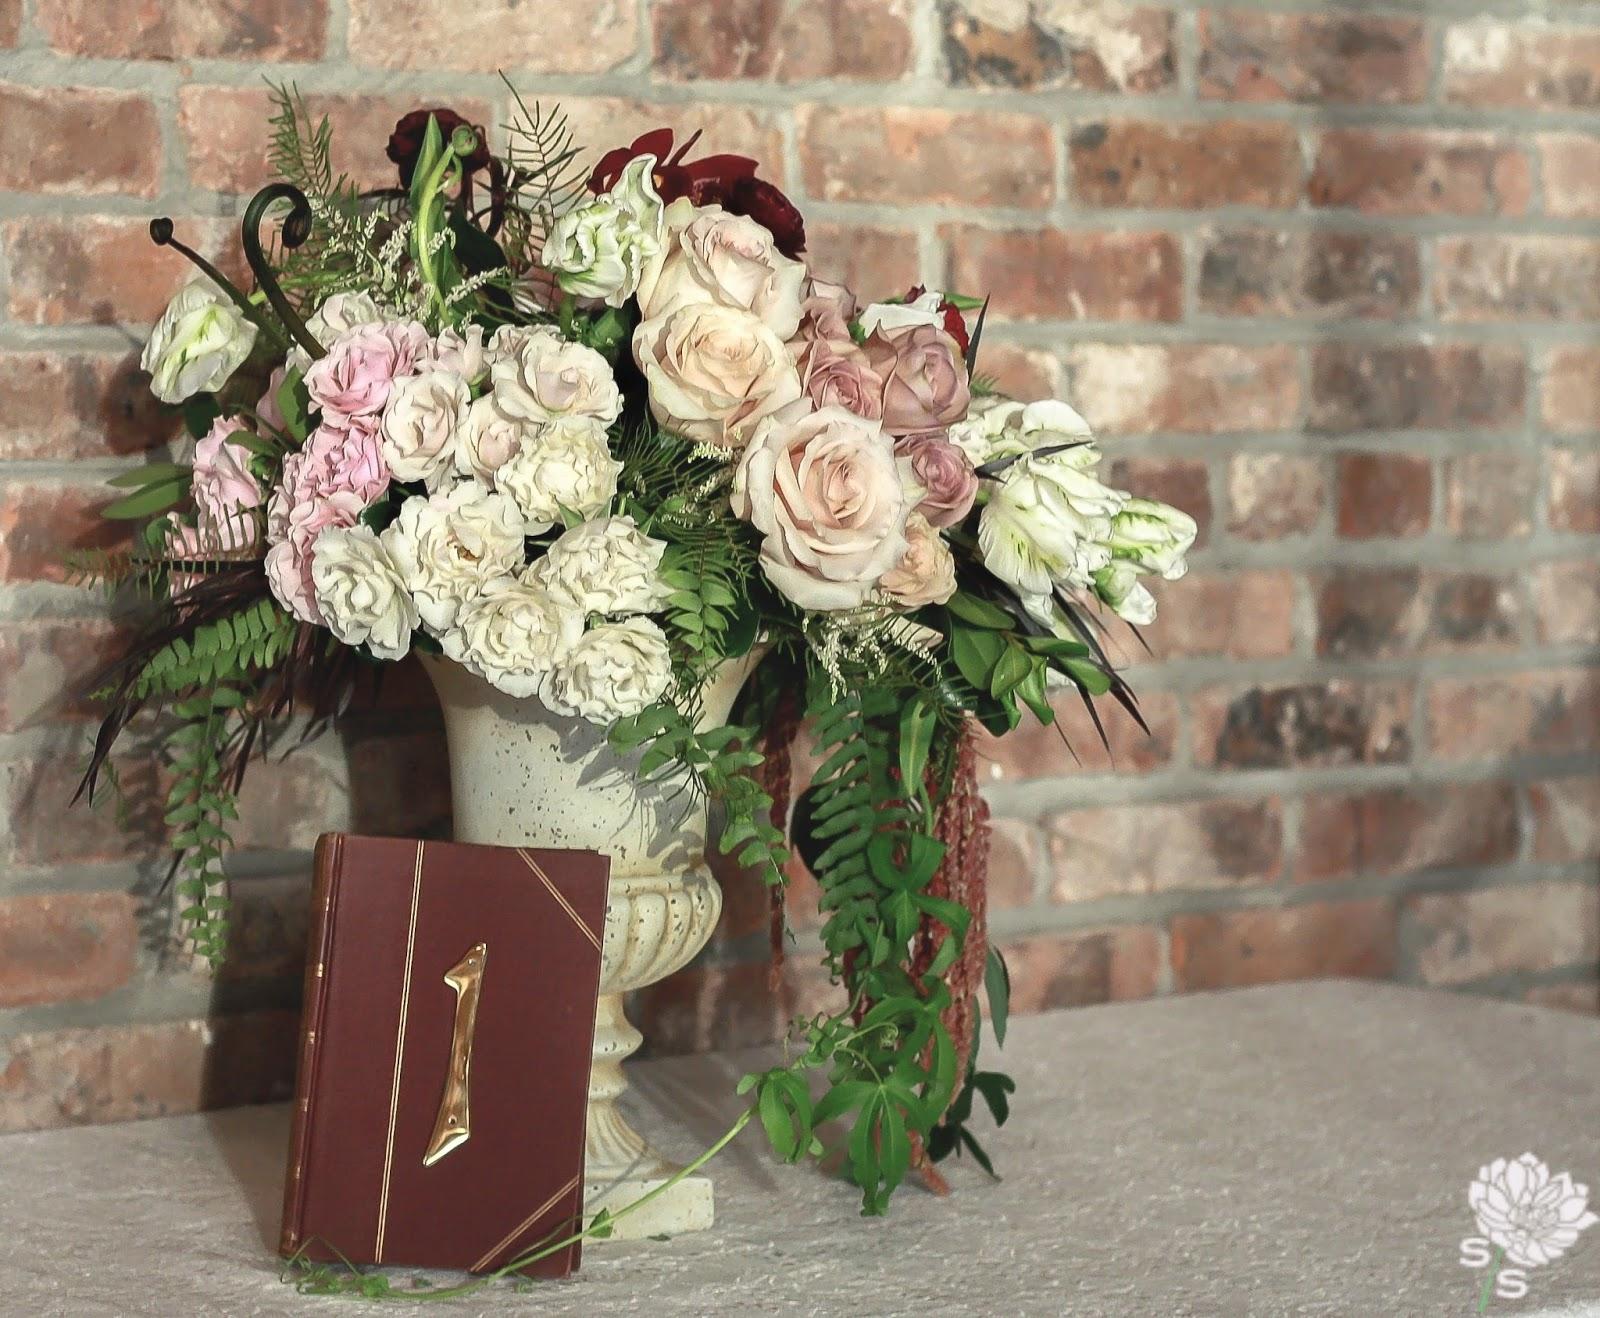 The Roundhouse Wedding - Beacon, NY - Hudson Valley Wedding - Exposed Brick - Wedding Flowers - Splendid Stems Floral Designs